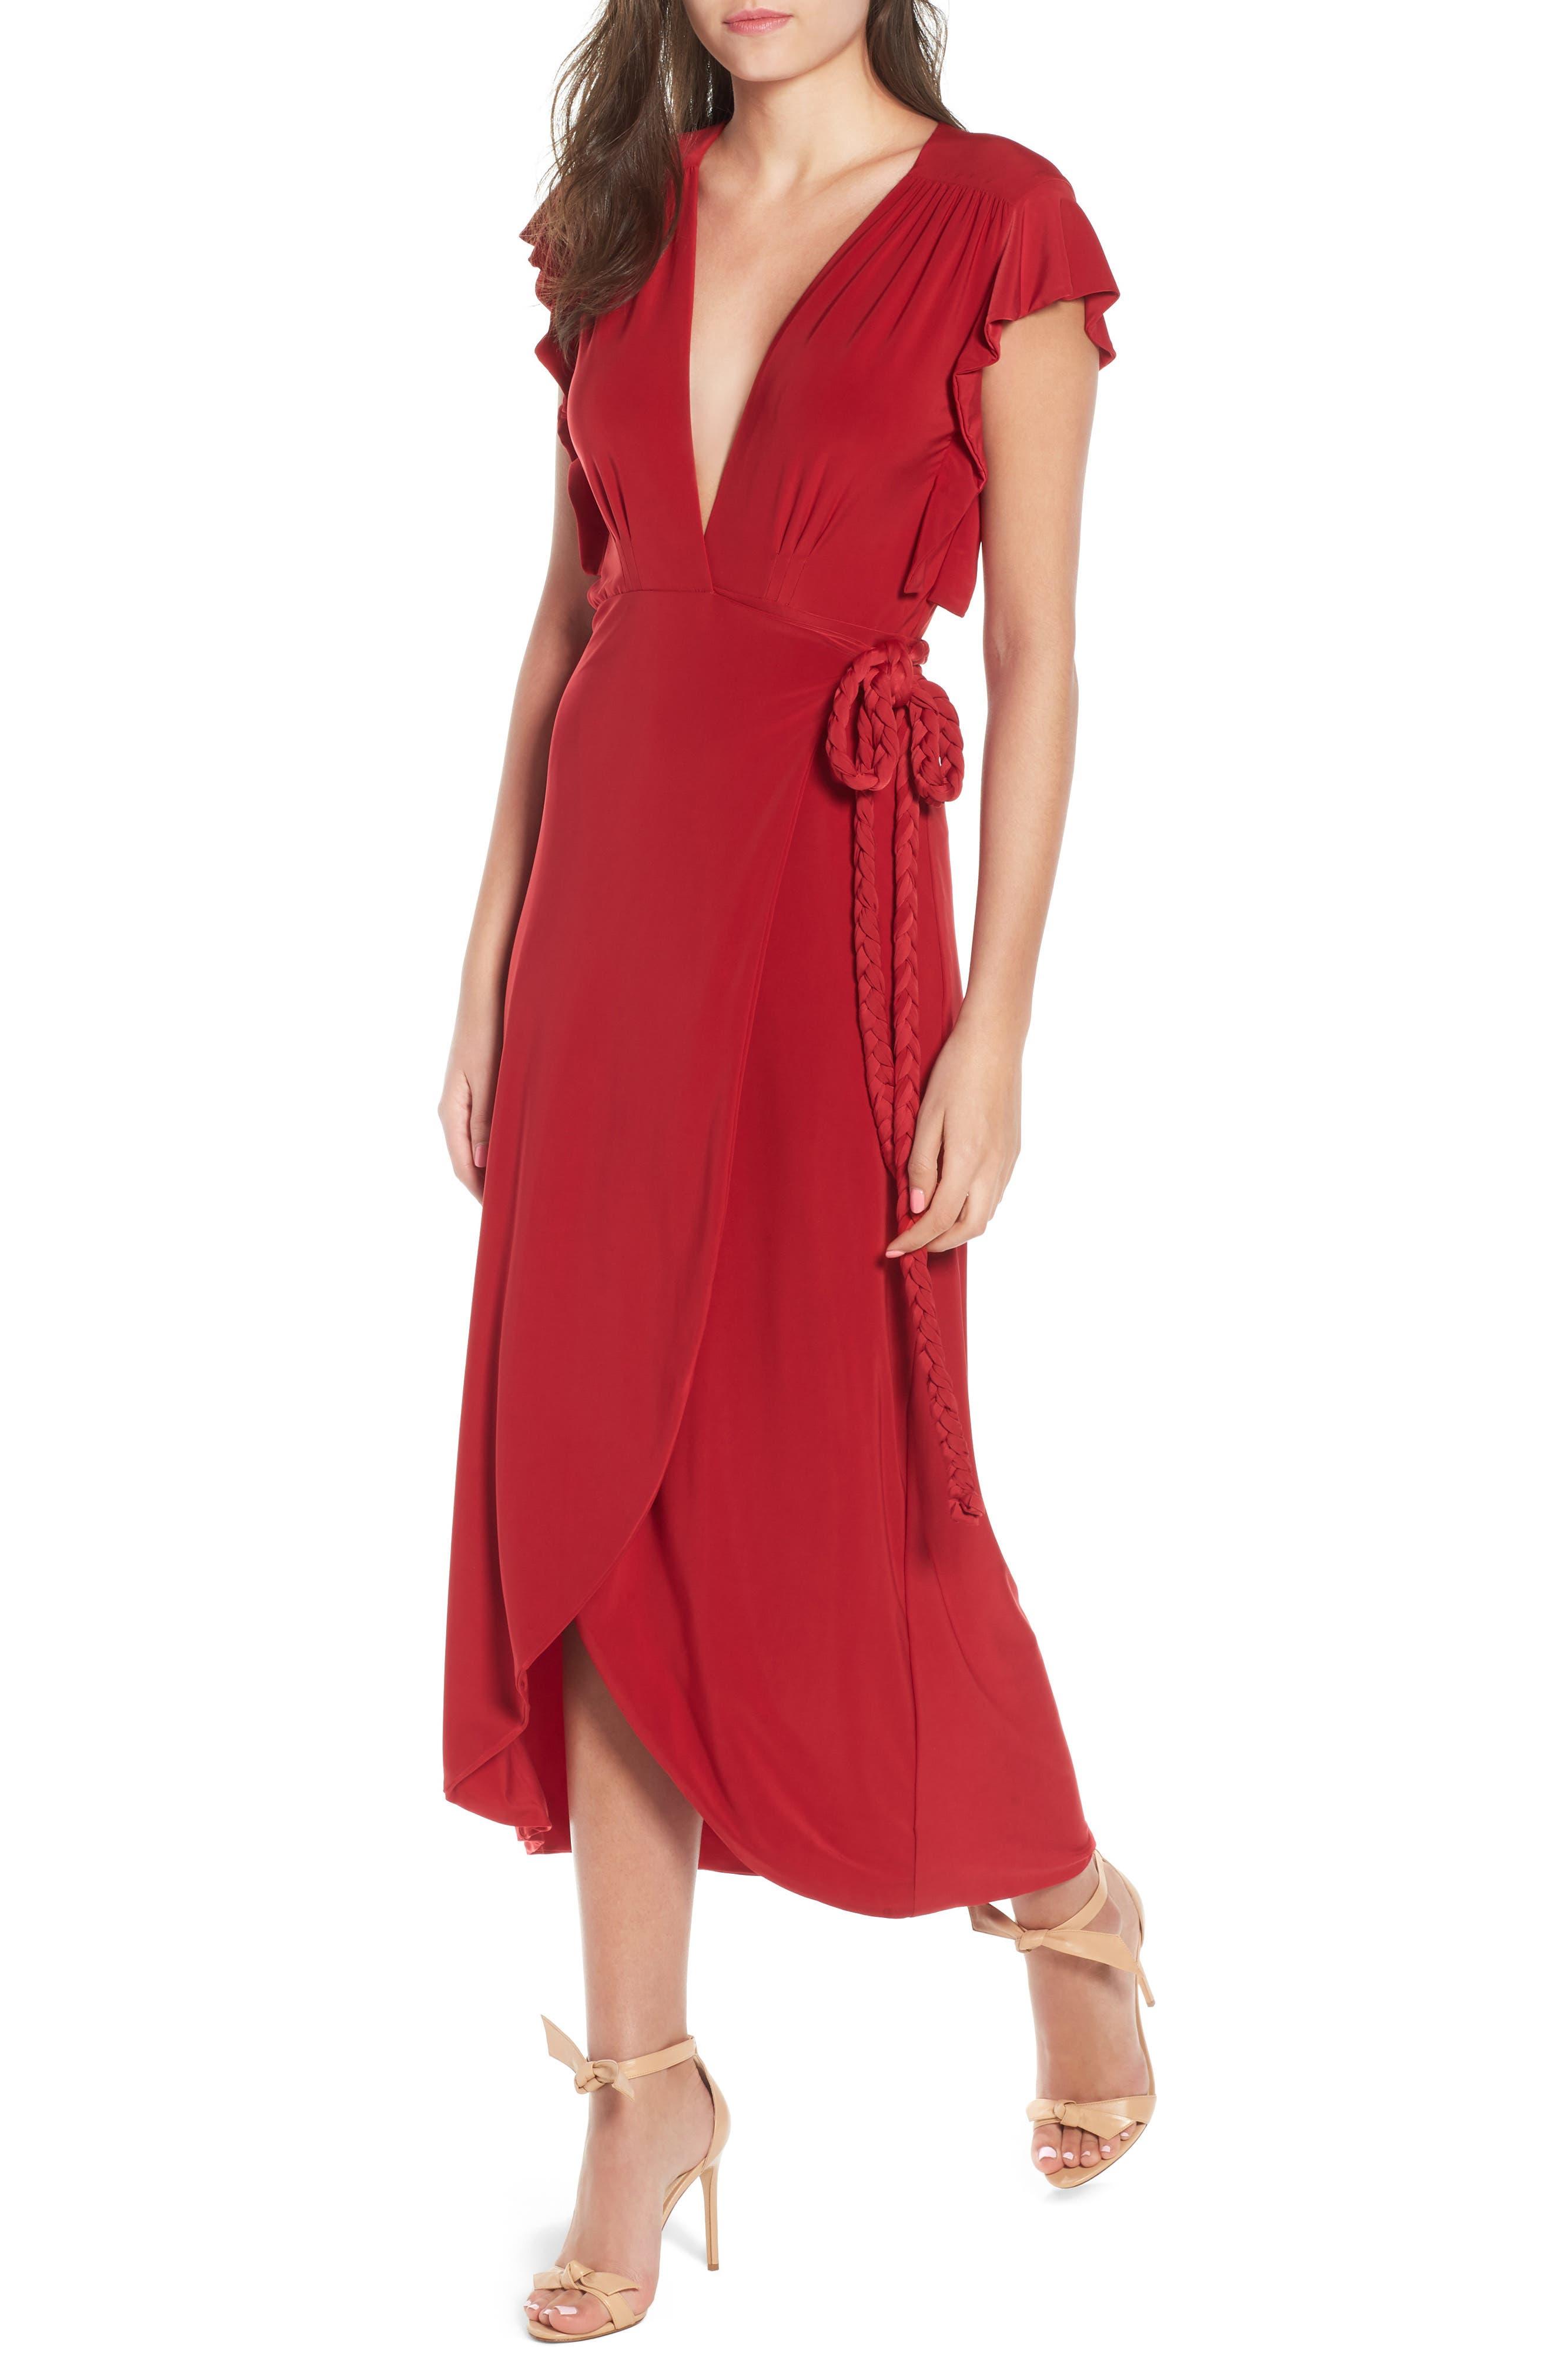 MISA LOS ANGELES Irina Dress, Main, color, RED